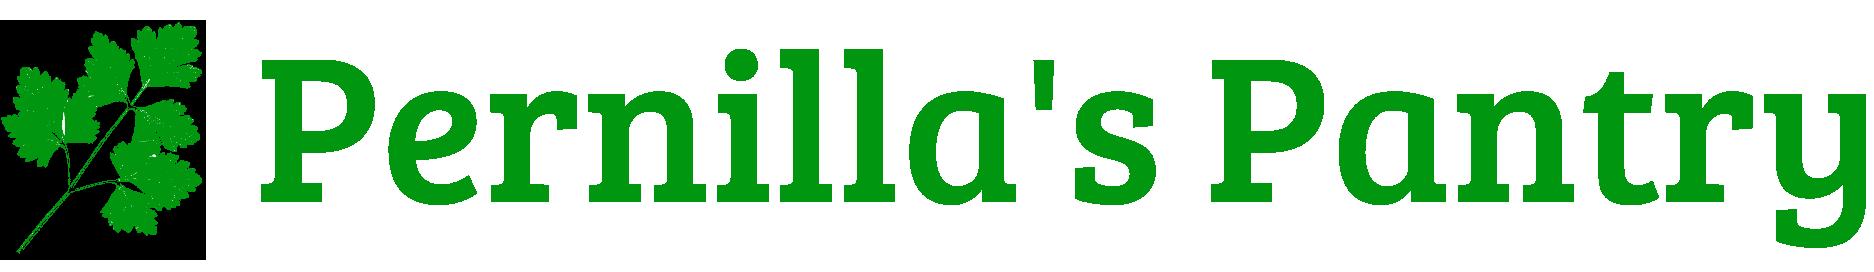 Pernilla's Pantry Logo